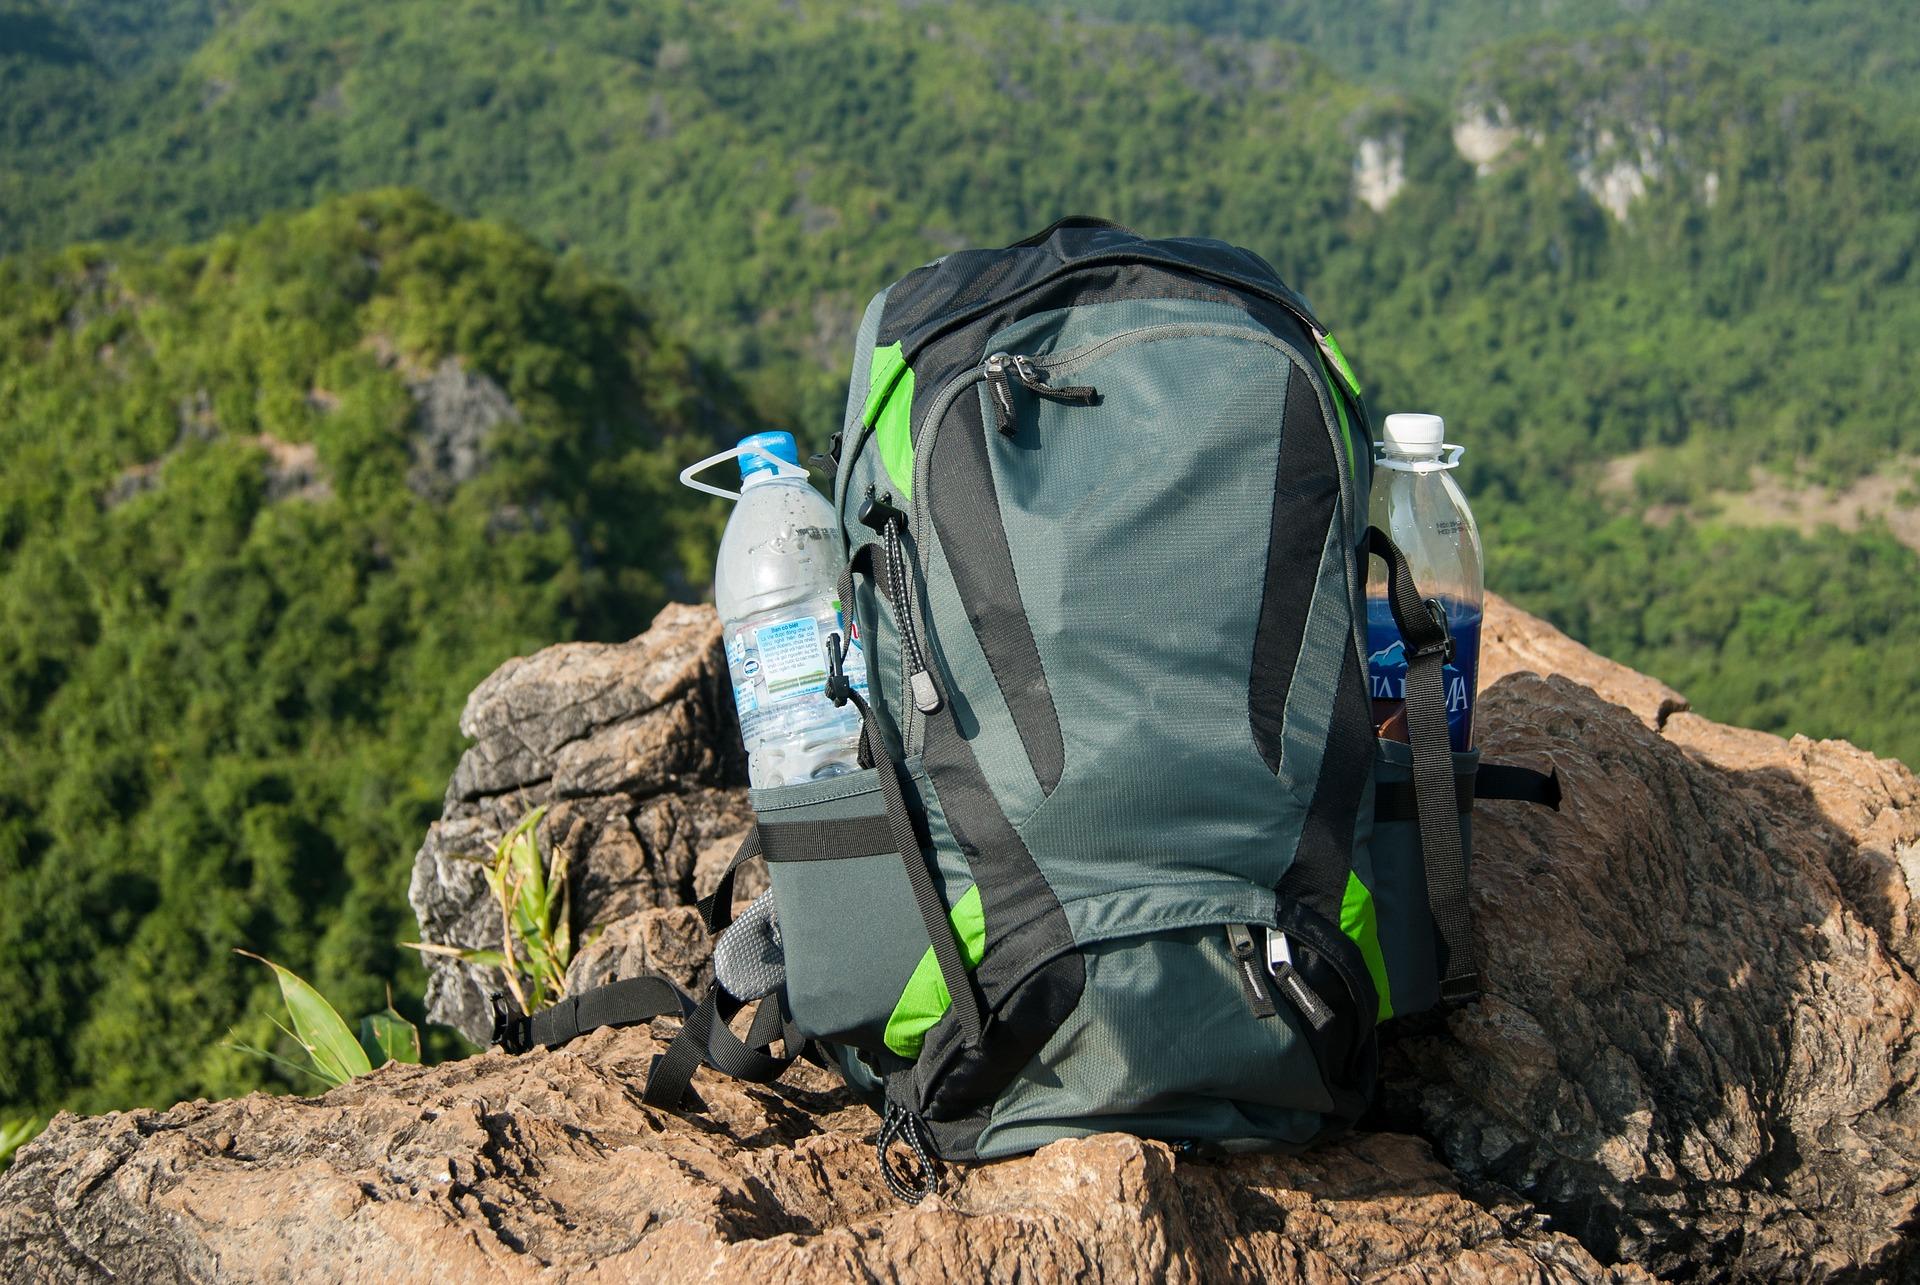 backpack-2239724_1920.jpg